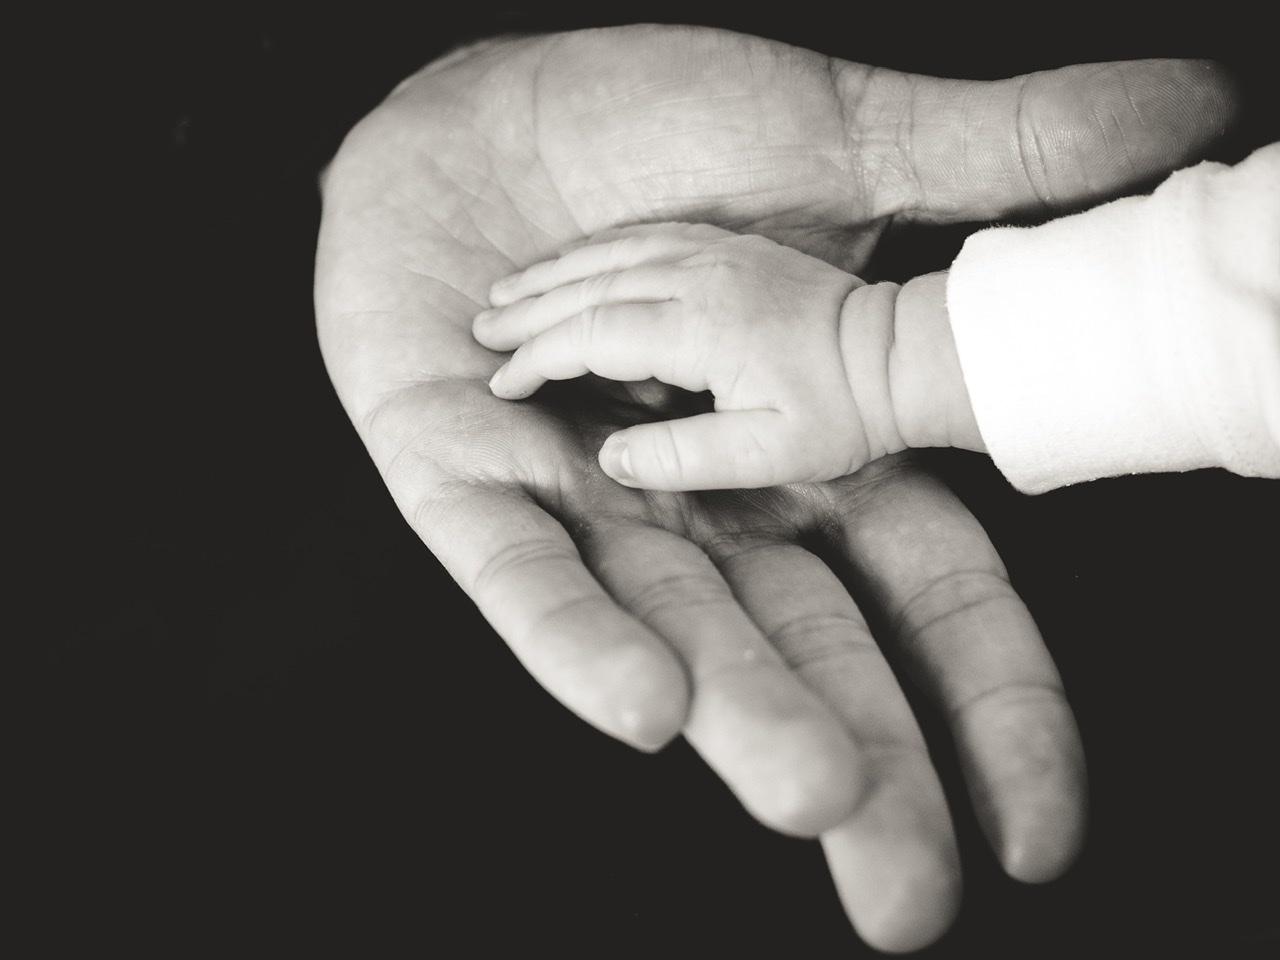 Benny hand